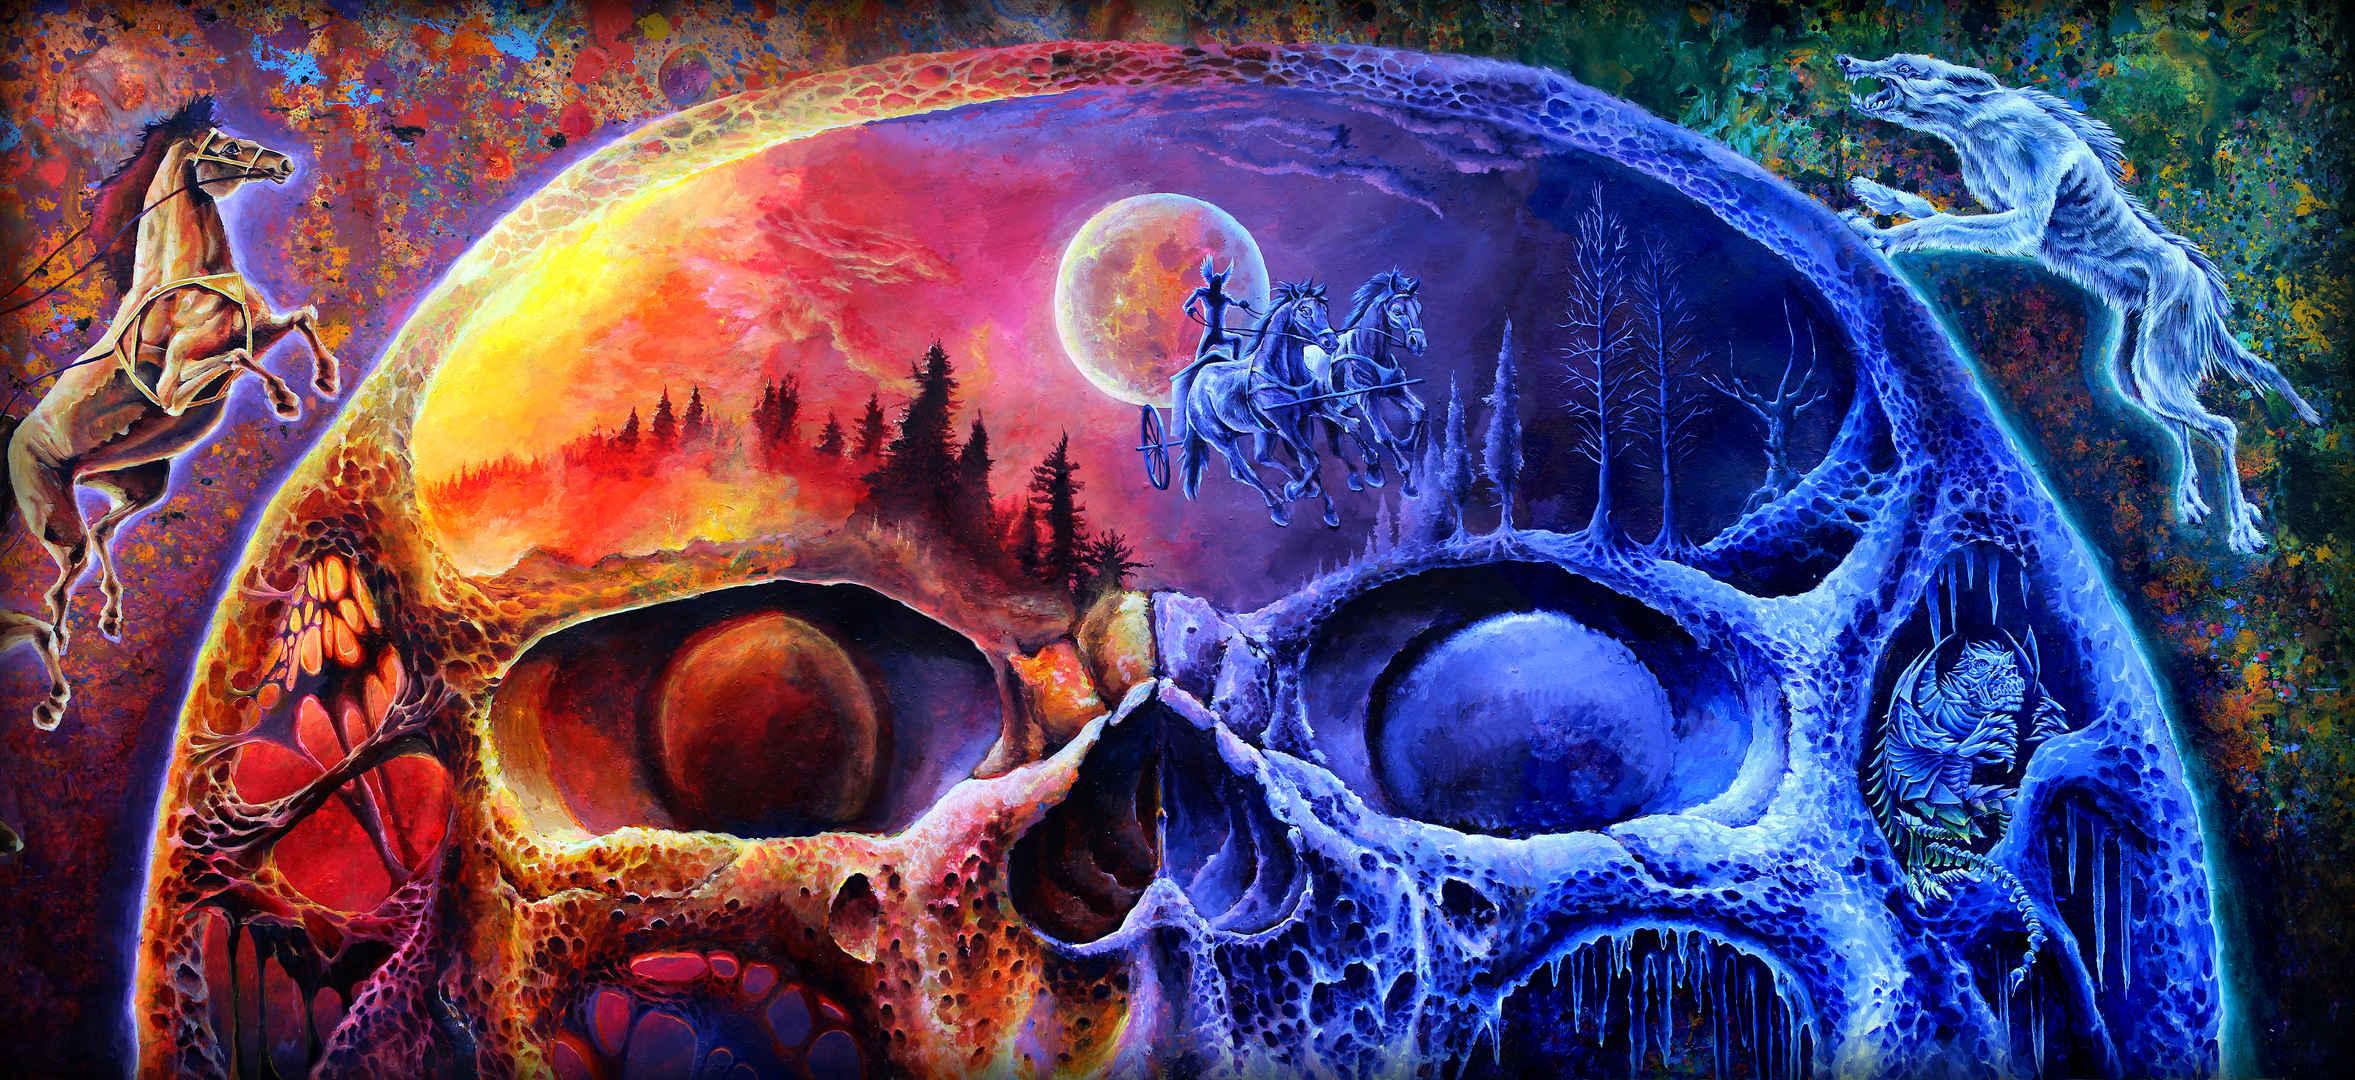 Ymir's skull